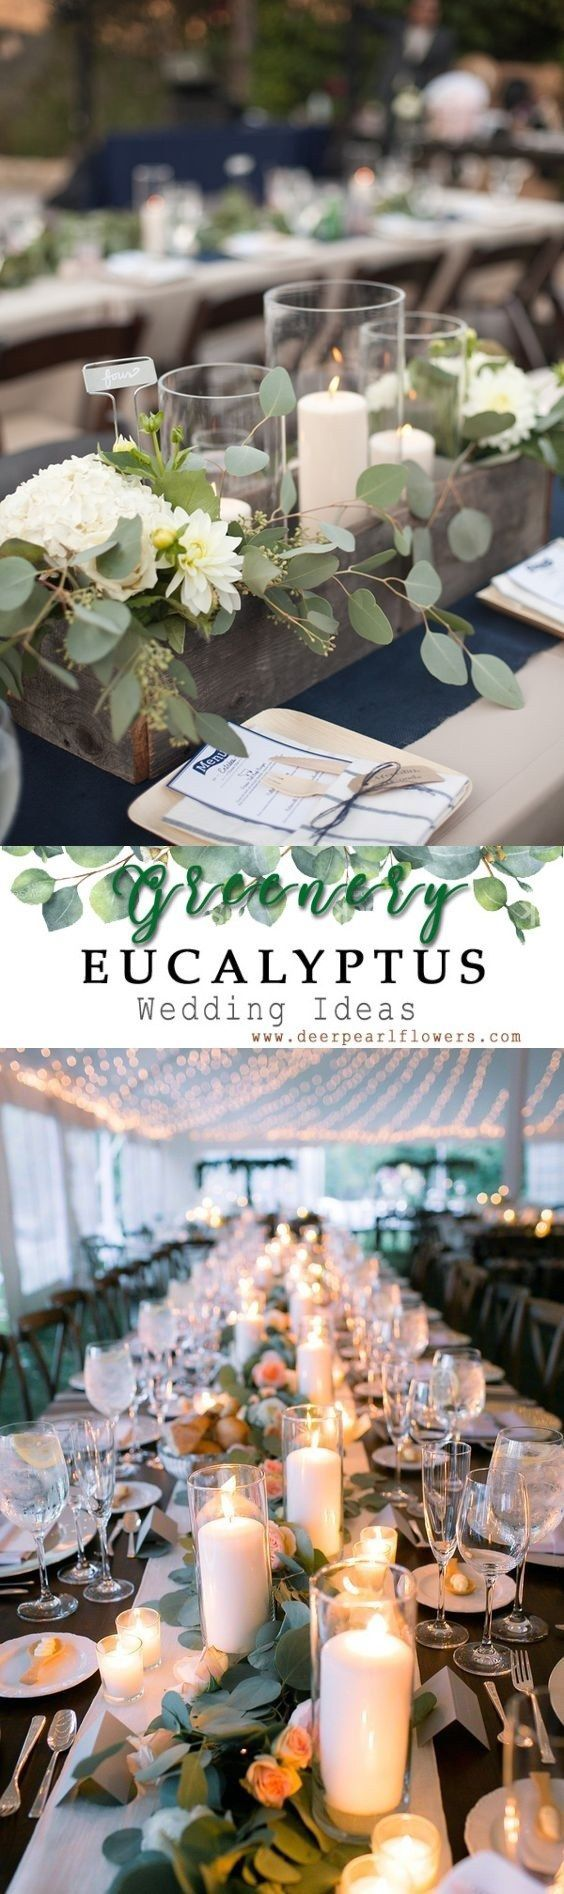 Wedding decorations on tables   Greenery Eucalyptus Wedding Decor Ideas  Interior addict